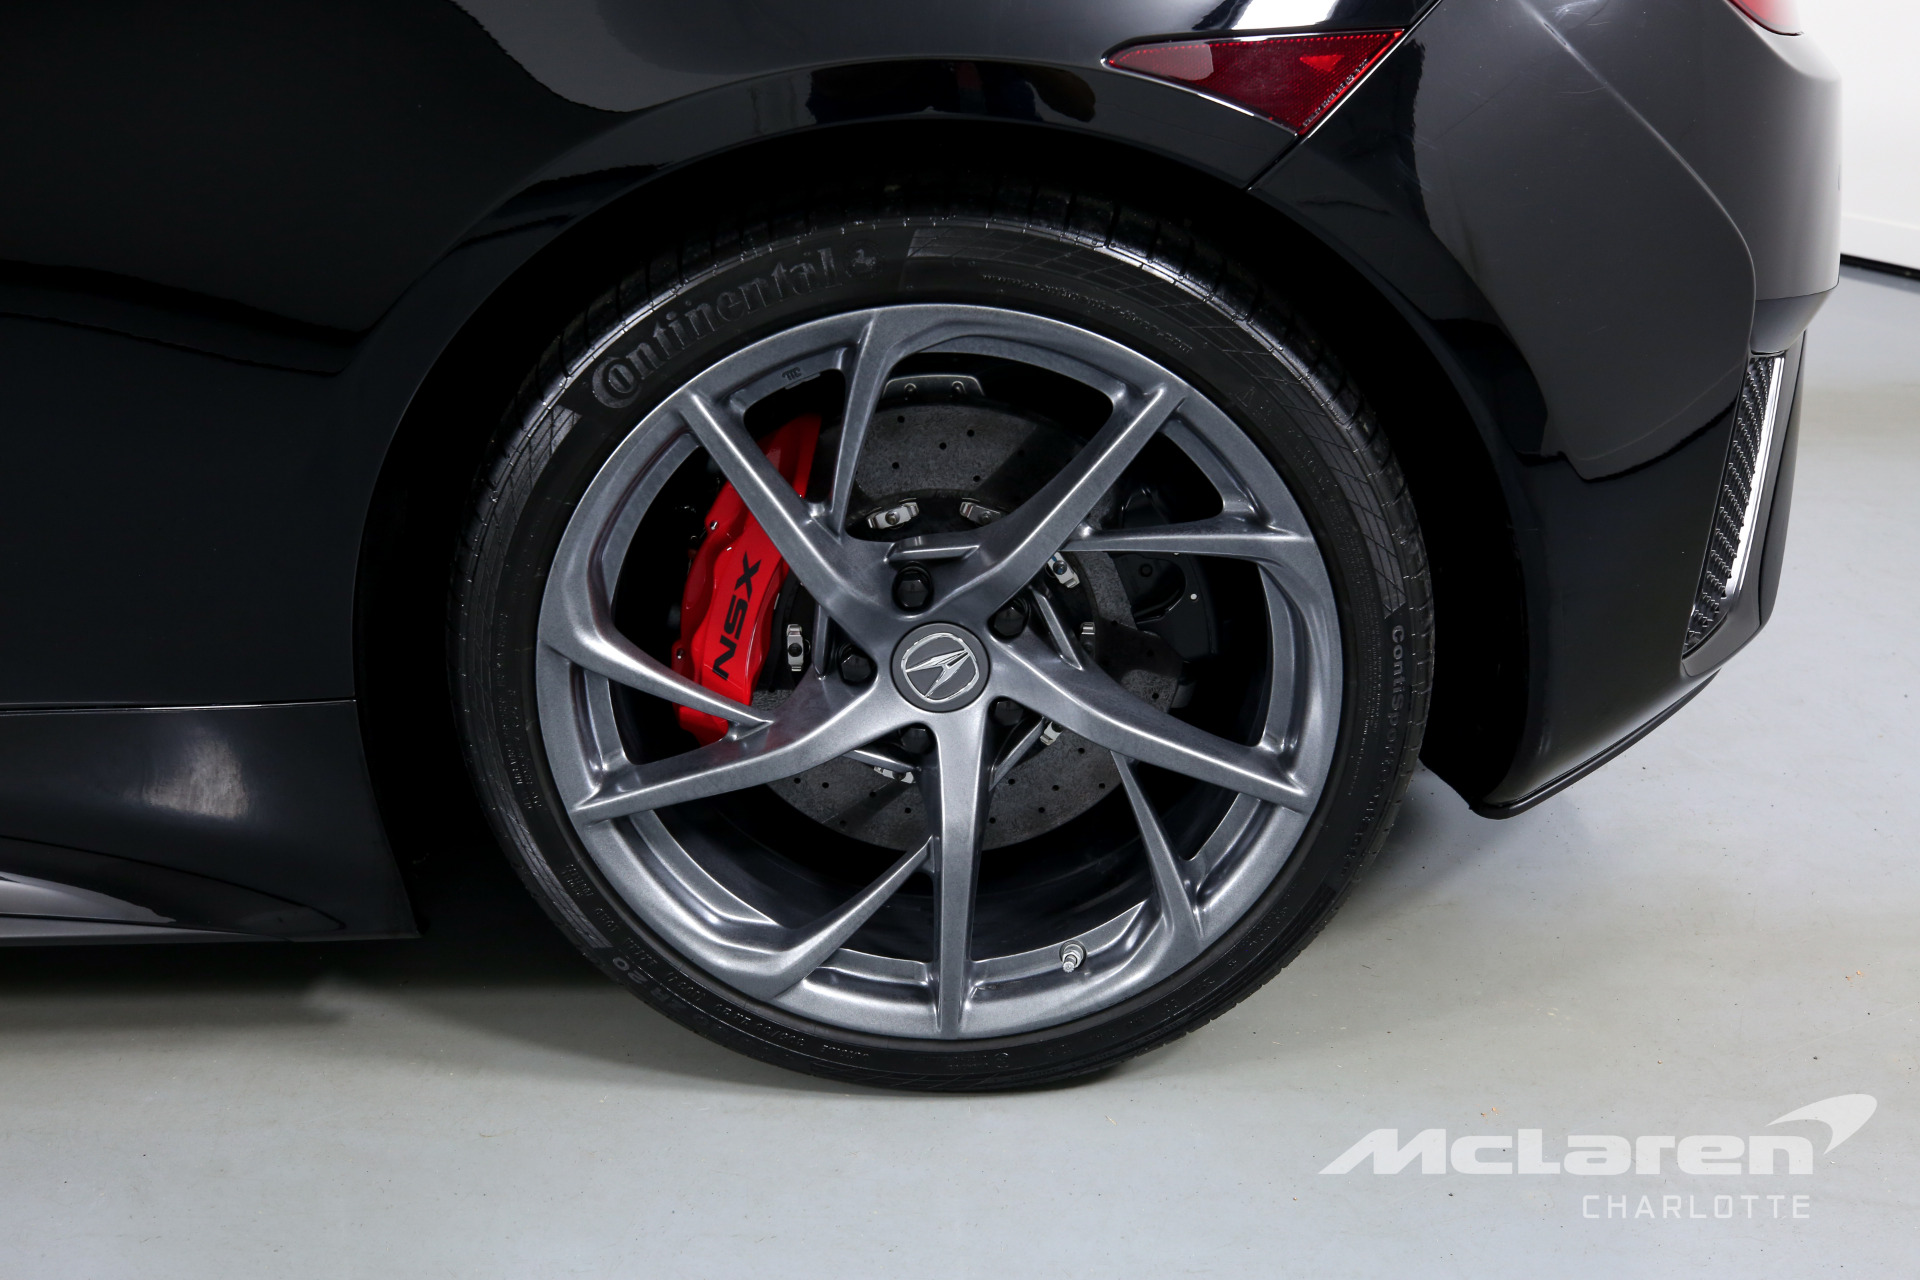 Used 2017 Acura NSX SH-AWD Sport Hybrid   Charlotte, NC